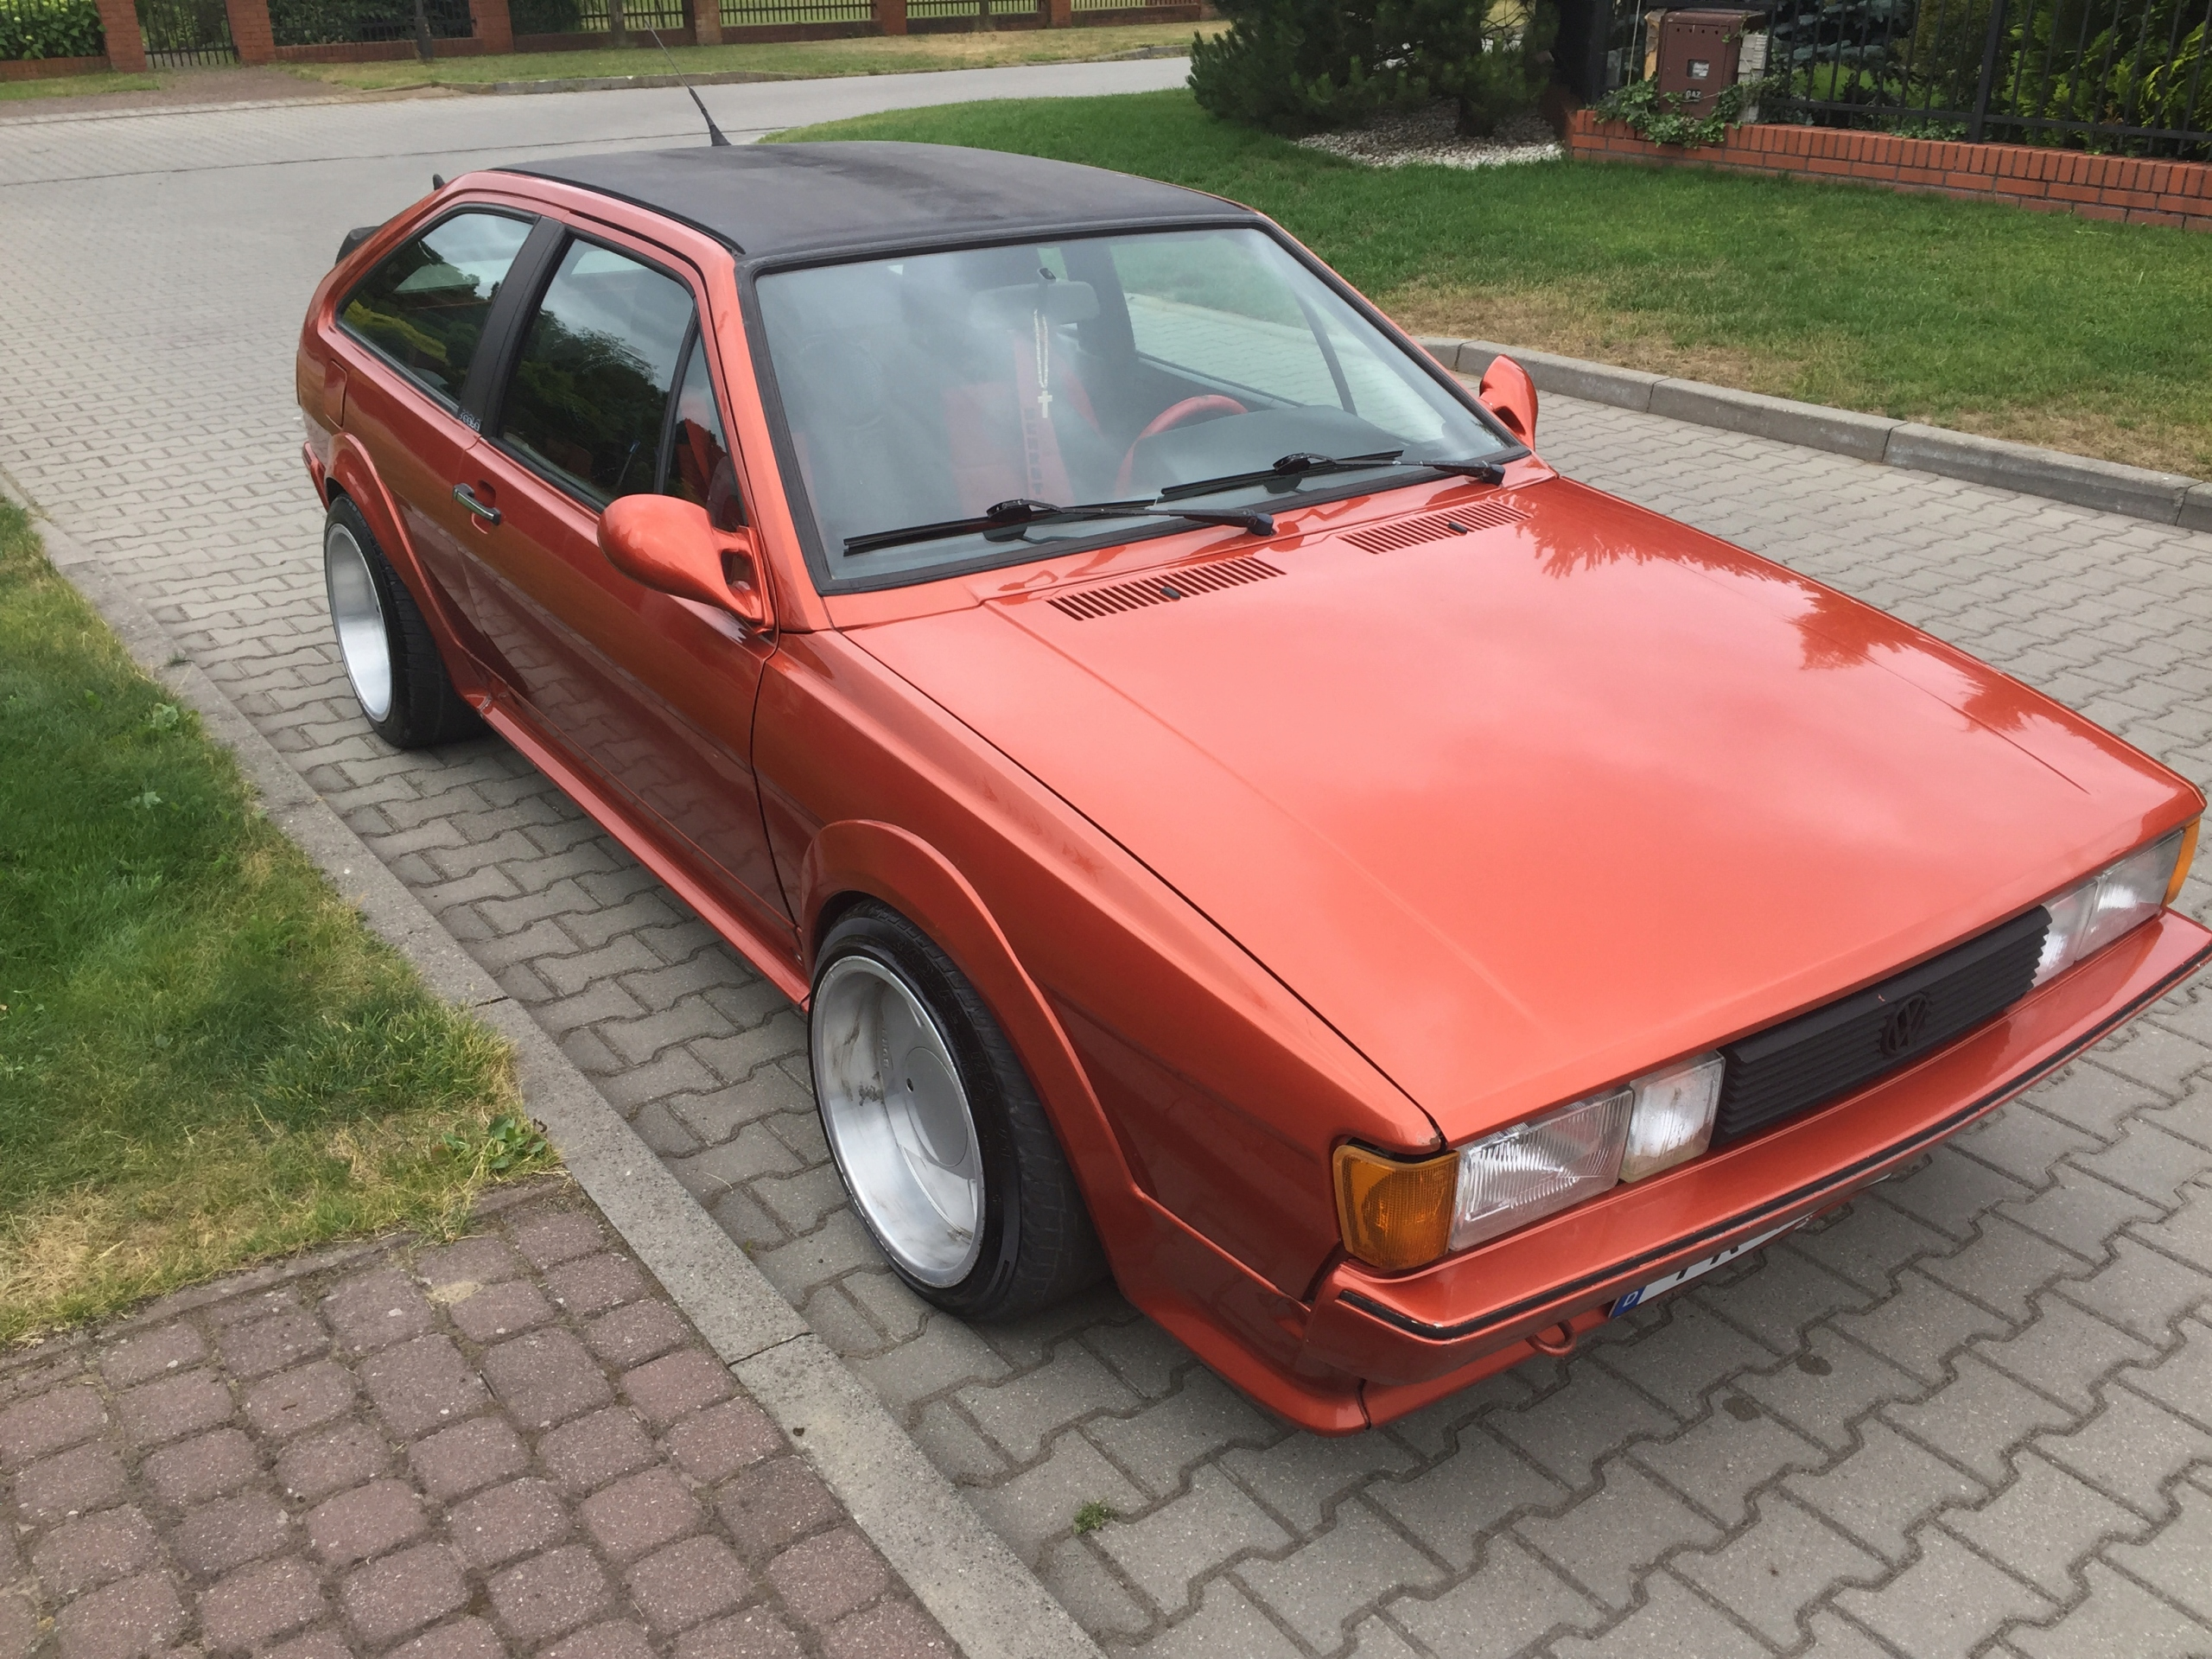 VW SIROCCO 1.8 1988 ROK OKAZJA !!!!!